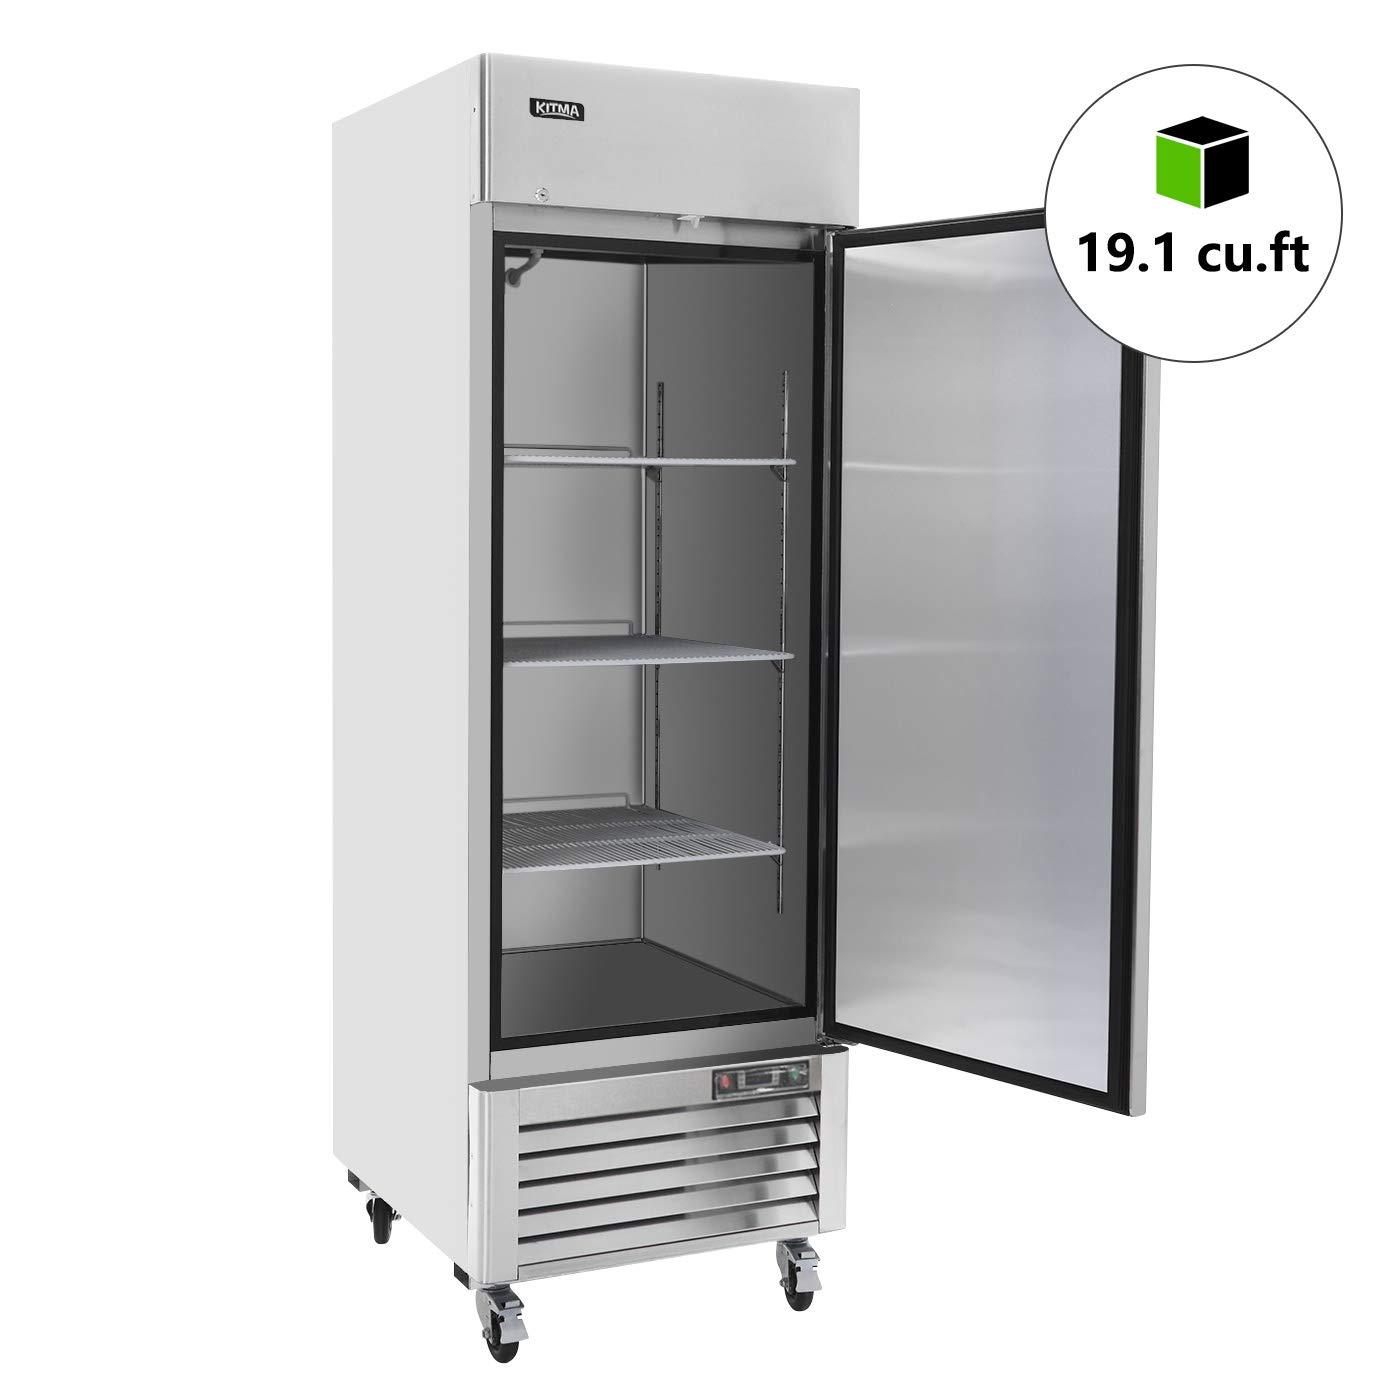 Amazon.com: Congelador vertical de puerta individual ...